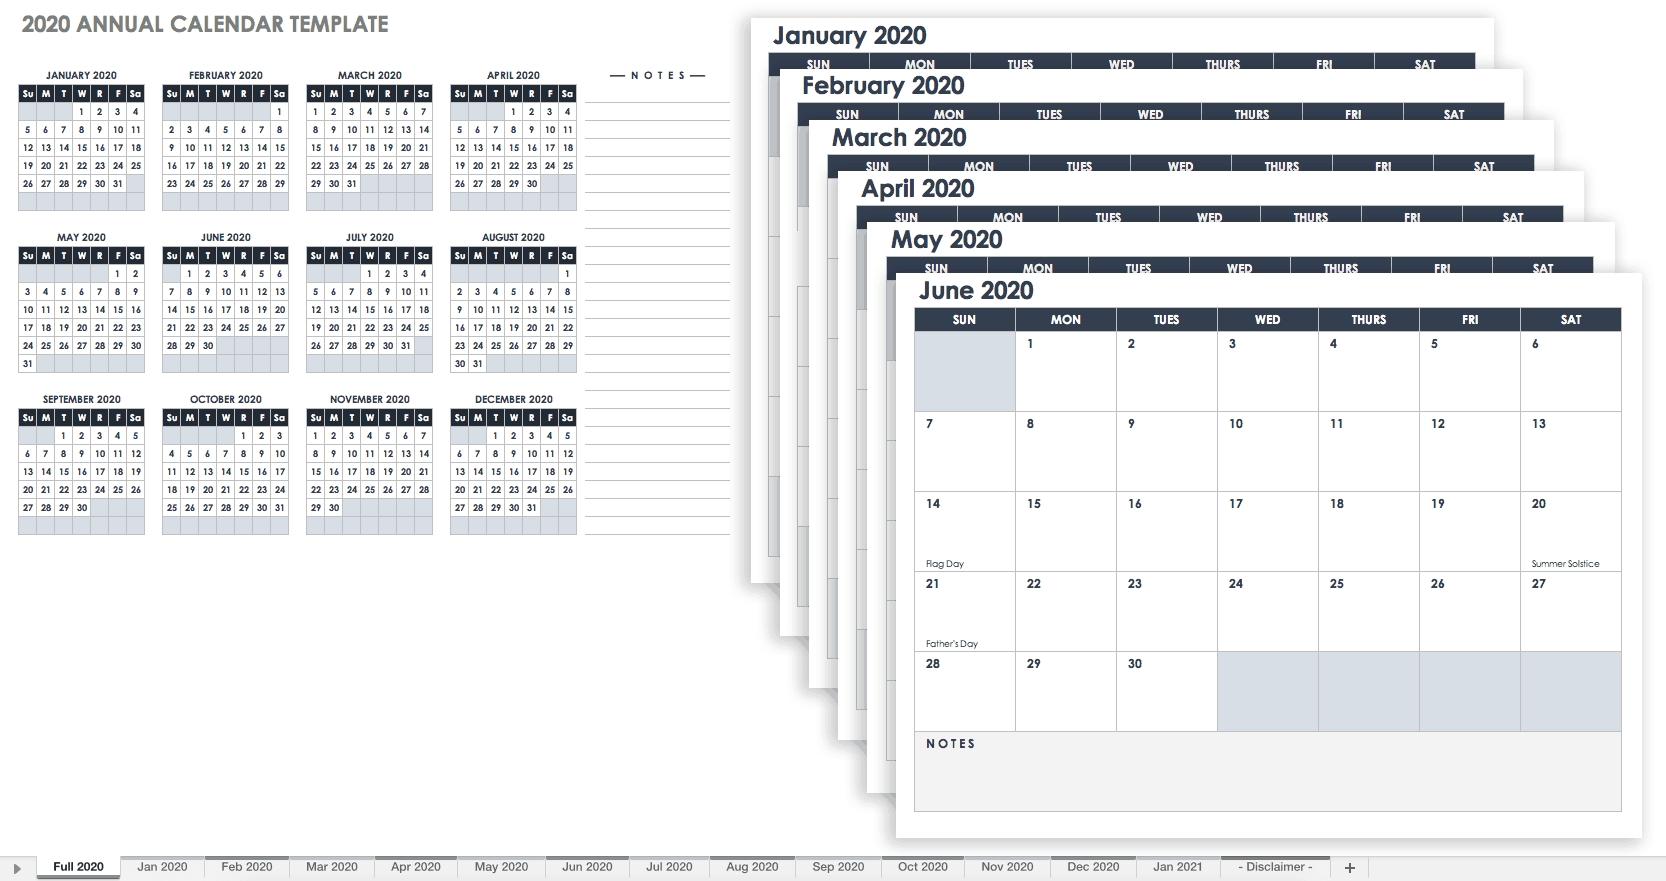 Free Blank Calendar Templates - Smartsheet-Employee Vacation Calendar Template 2020 Printable Free